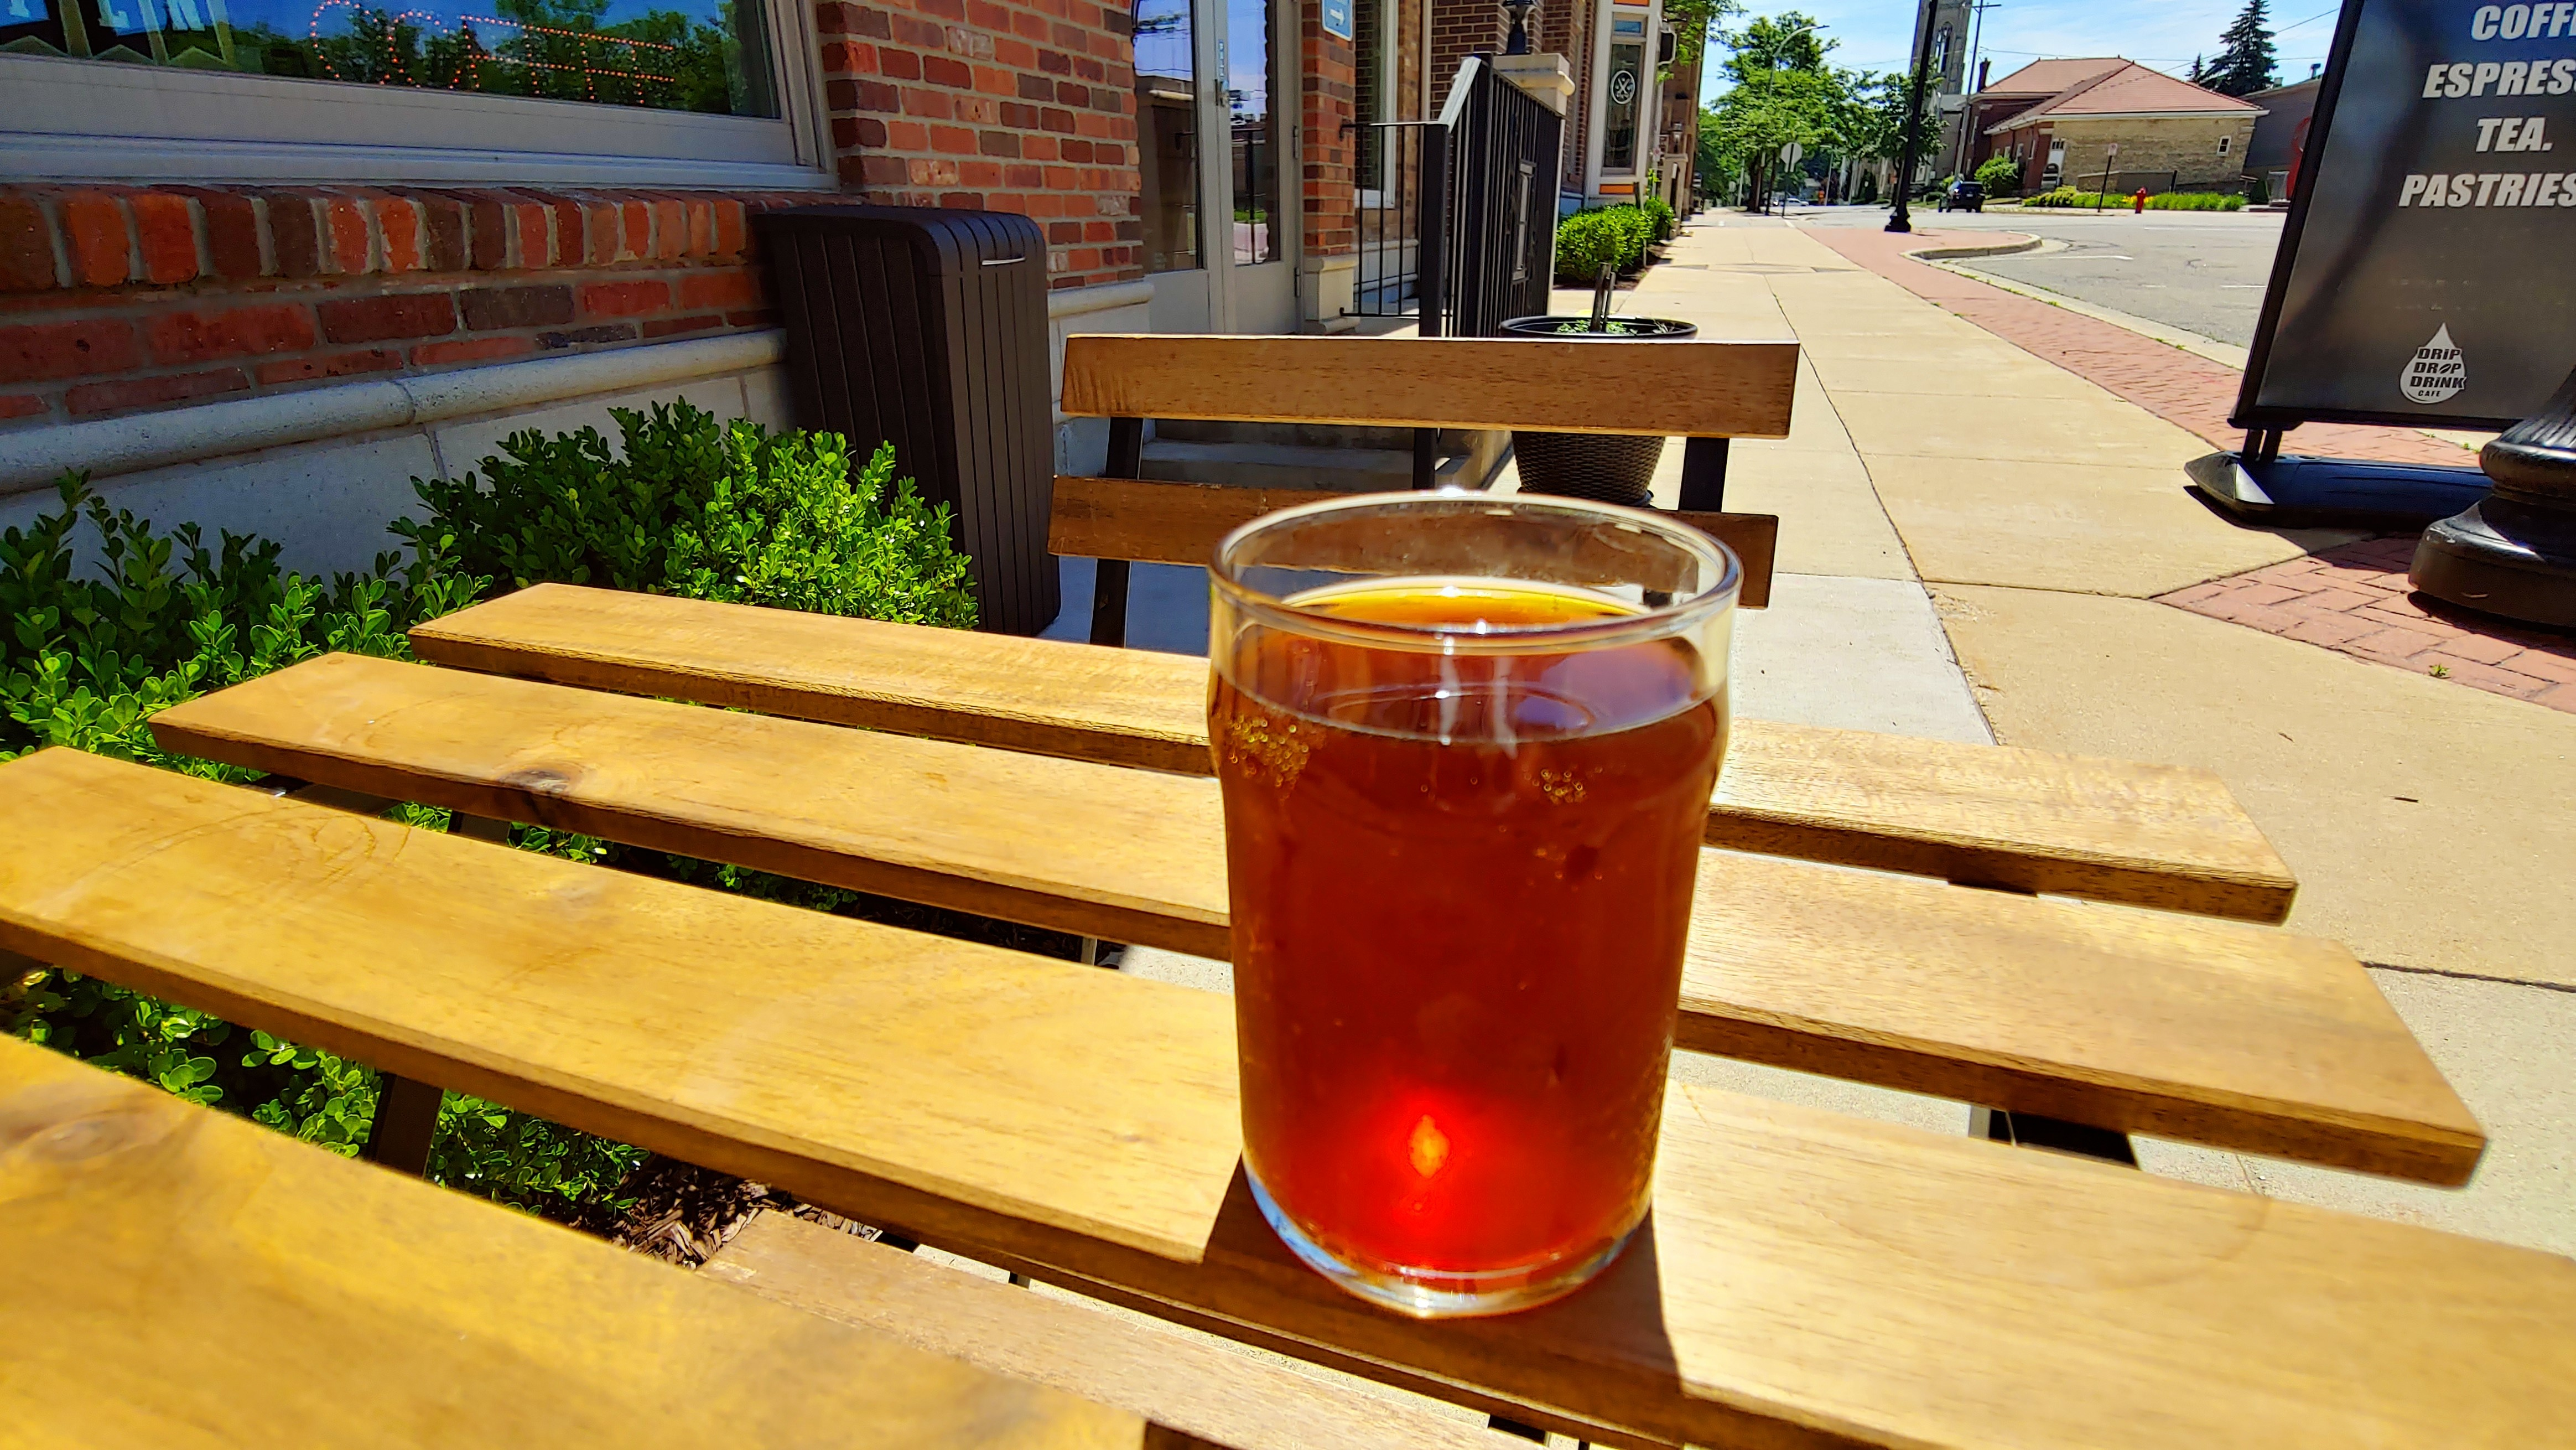 Best Coffee Shop in Downtown Muskegon, Drip Drop Drink